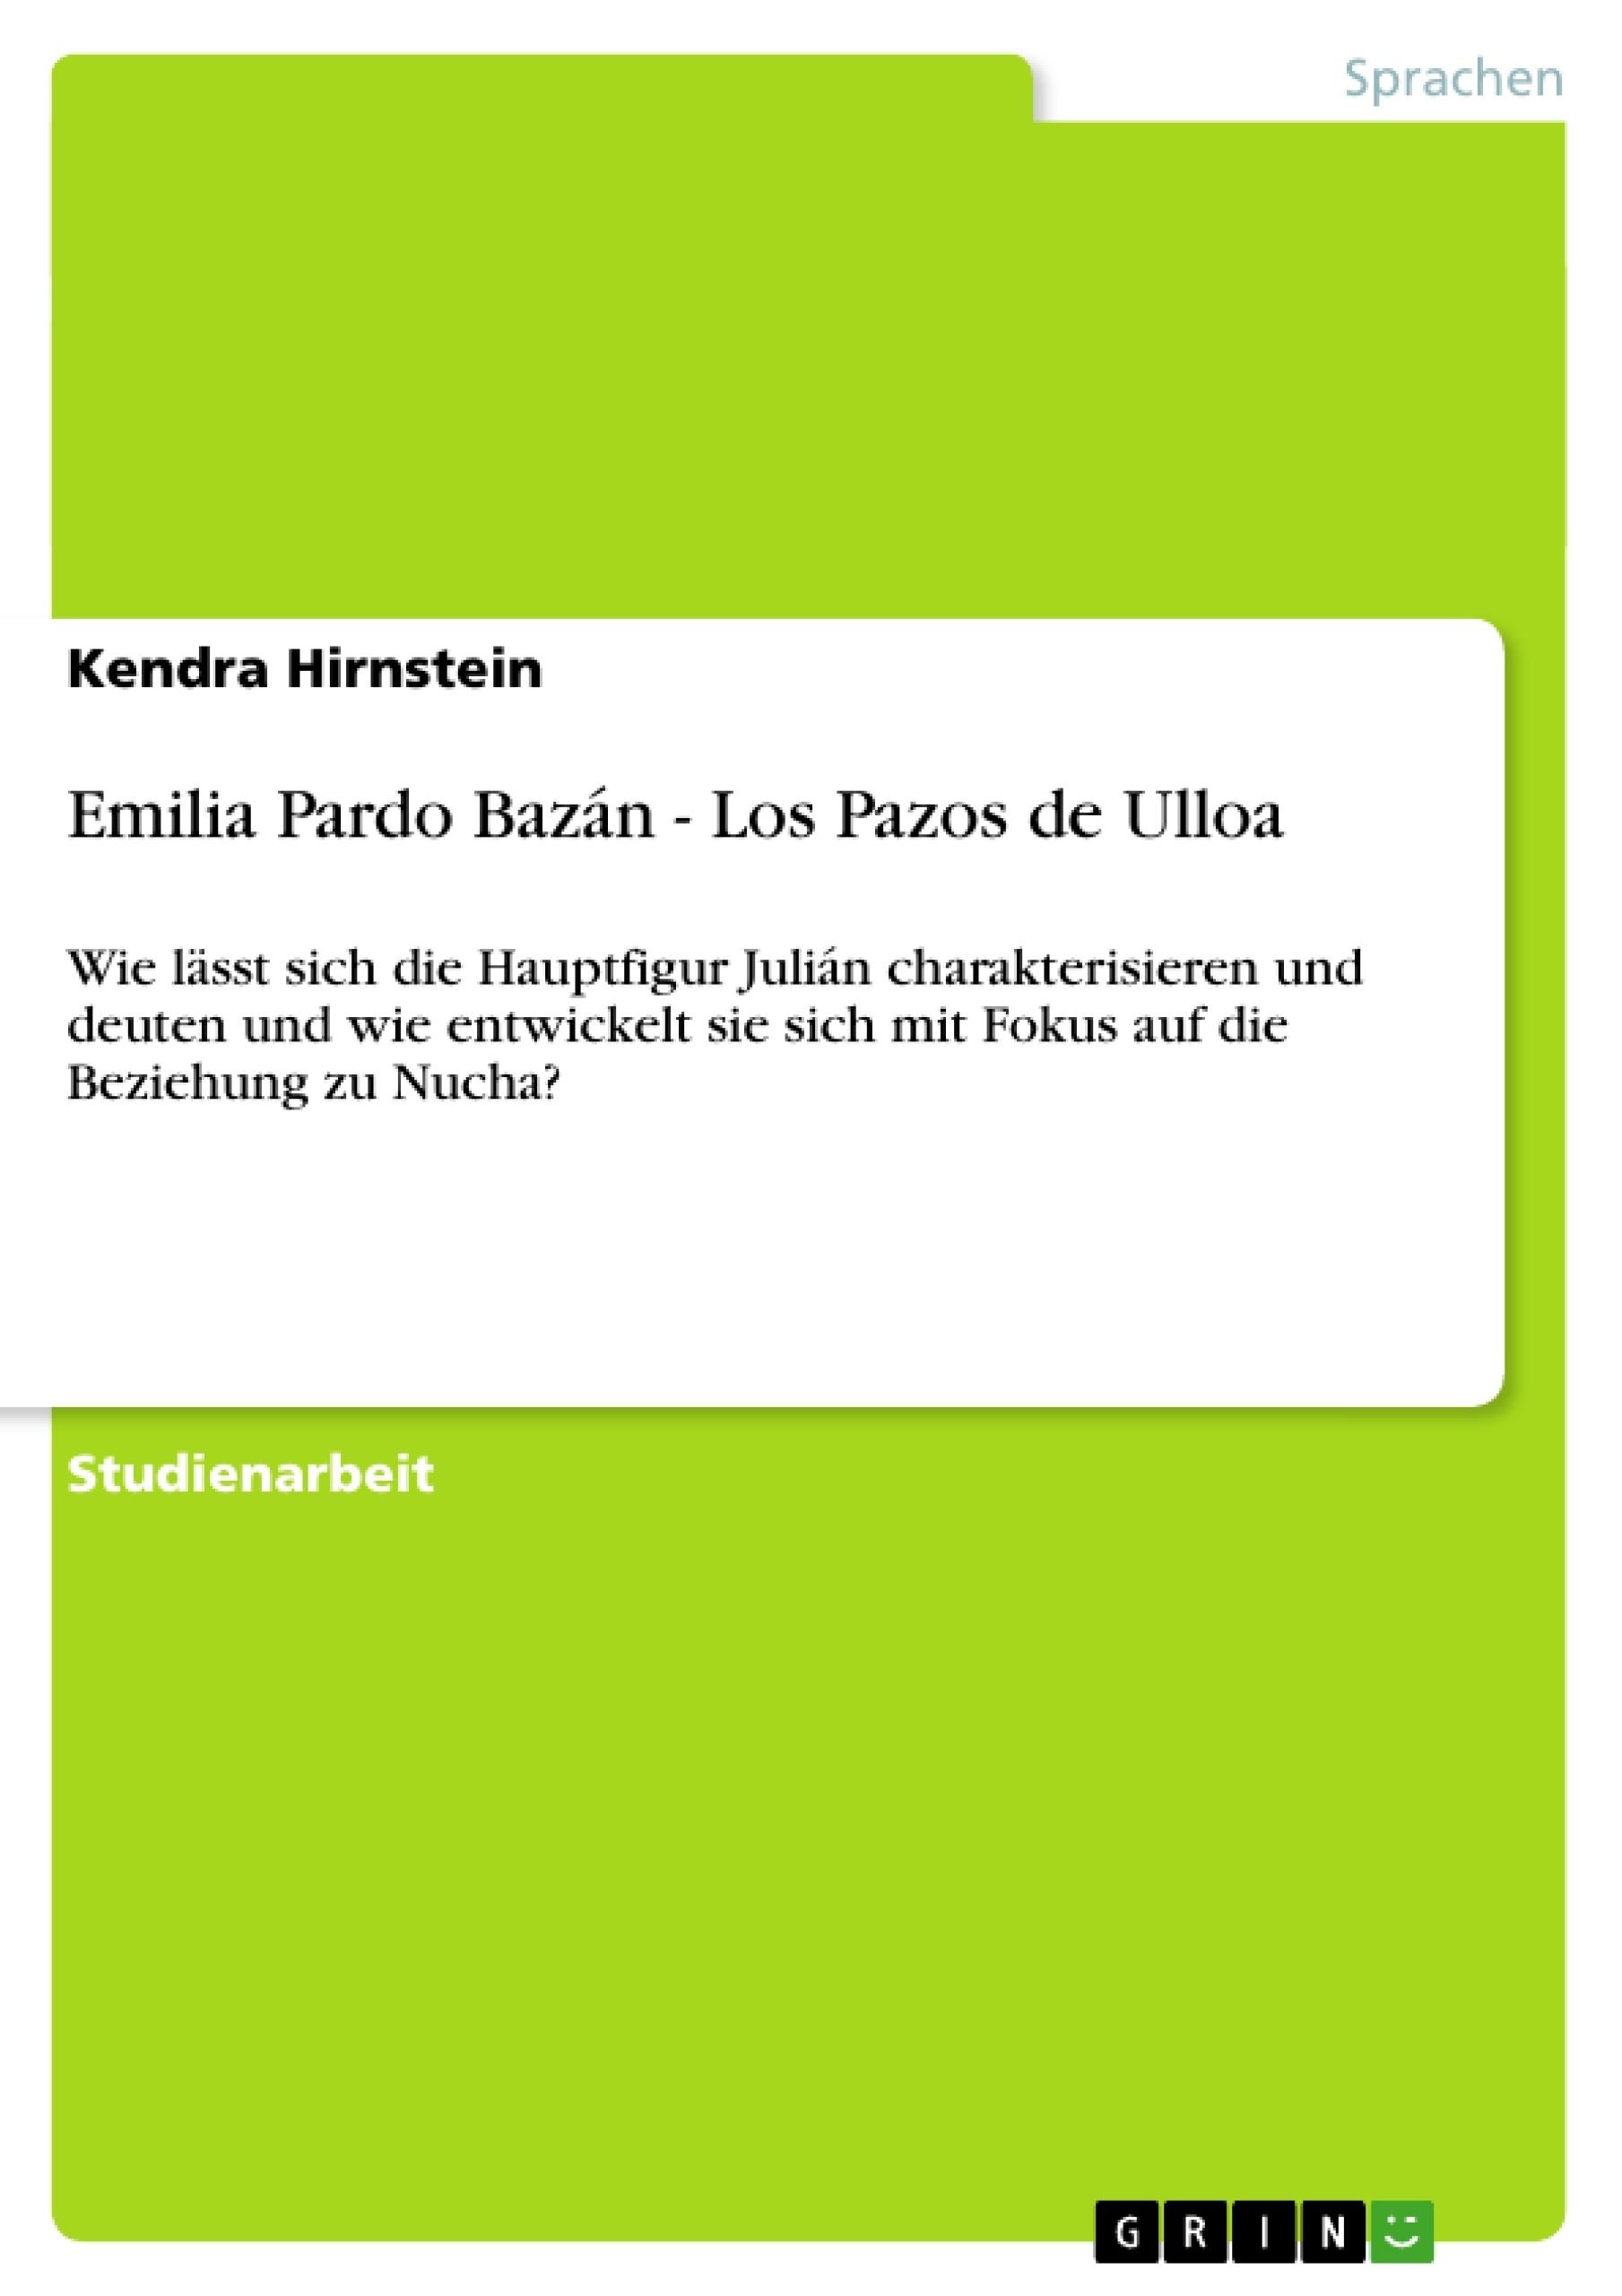 Titel: Emilia Pardo Bazán - Los Pazos de Ulloa